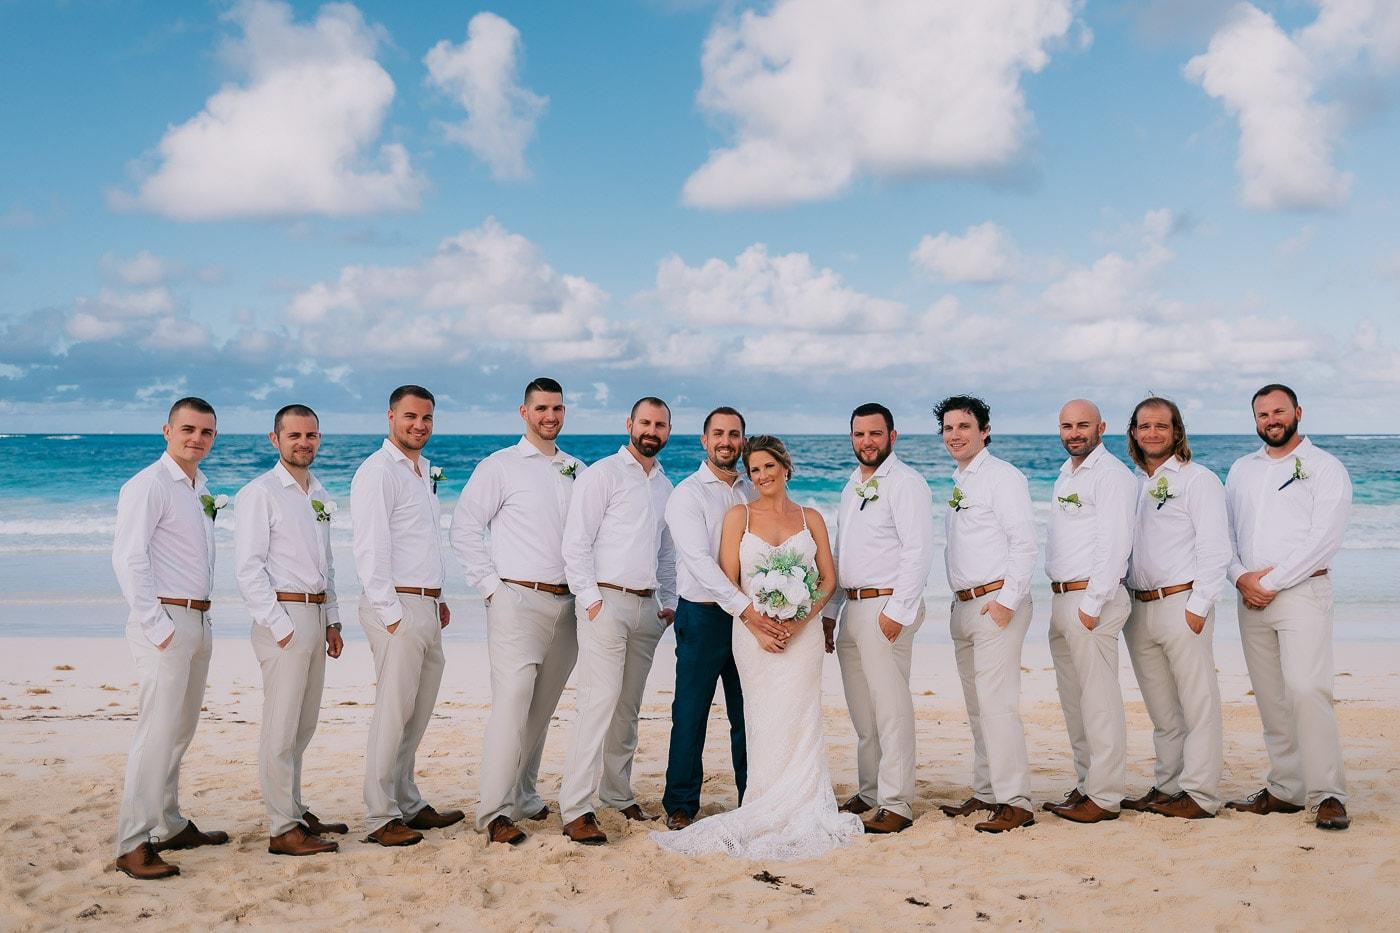 groomsmen attire for a beach wedding